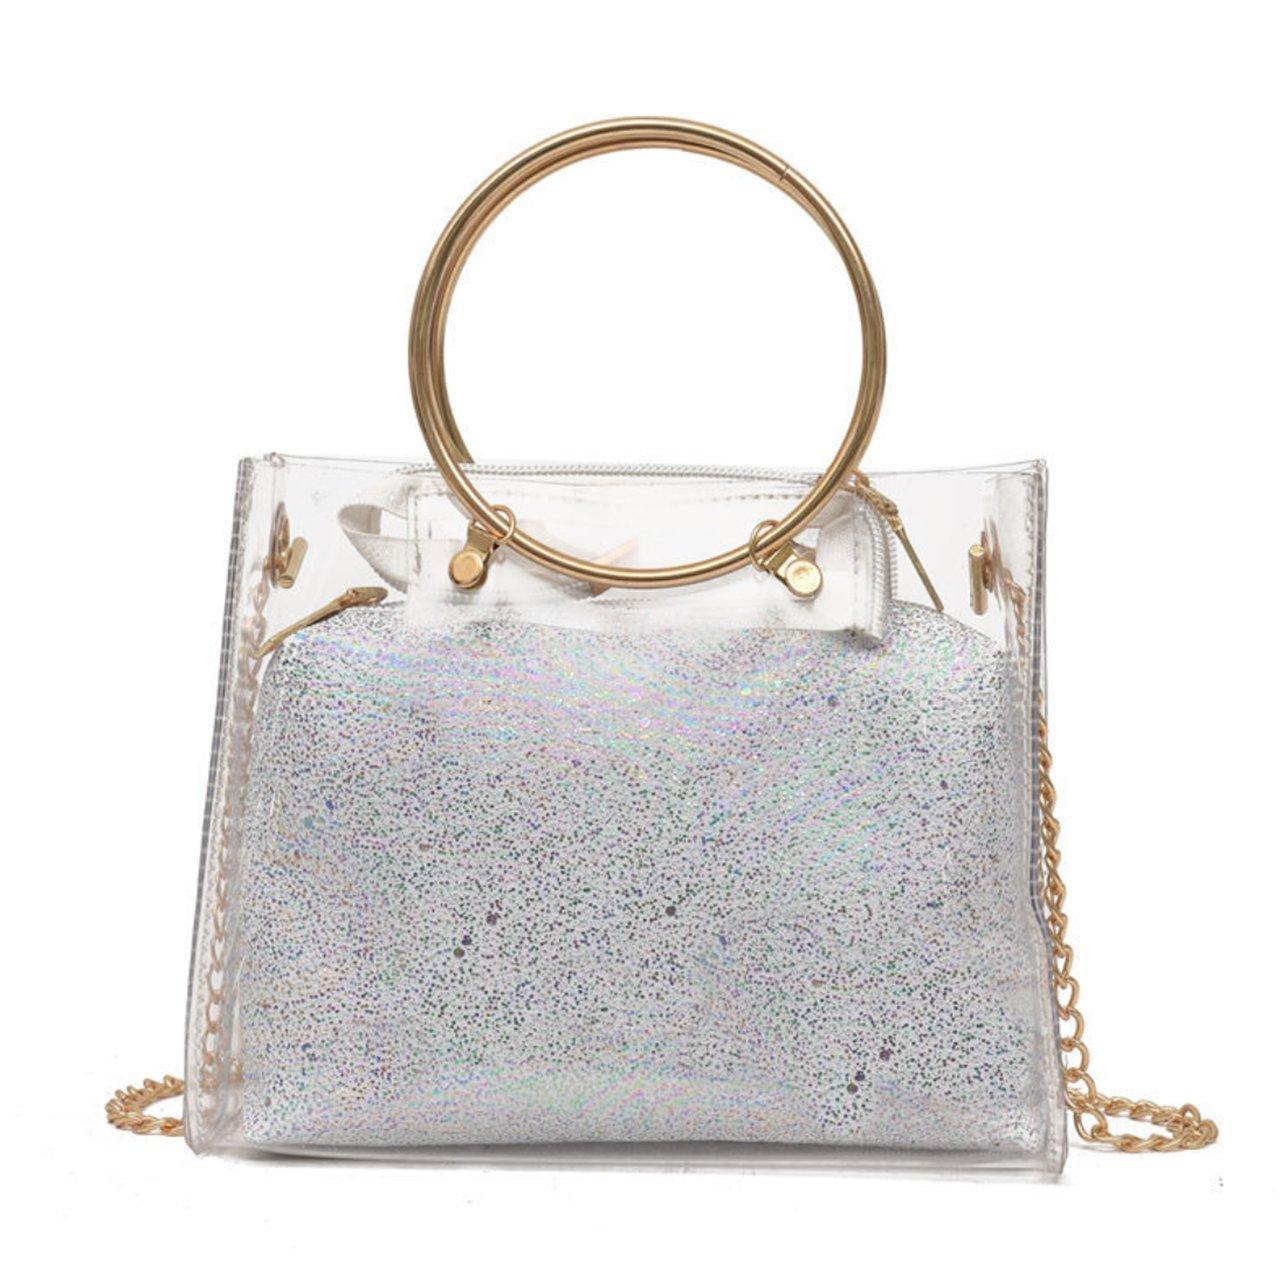 Women's Clear Transparent Metallic Strap Shoulder Crossbody Handbag Clutch with Inner Cosmetic Bag (White)